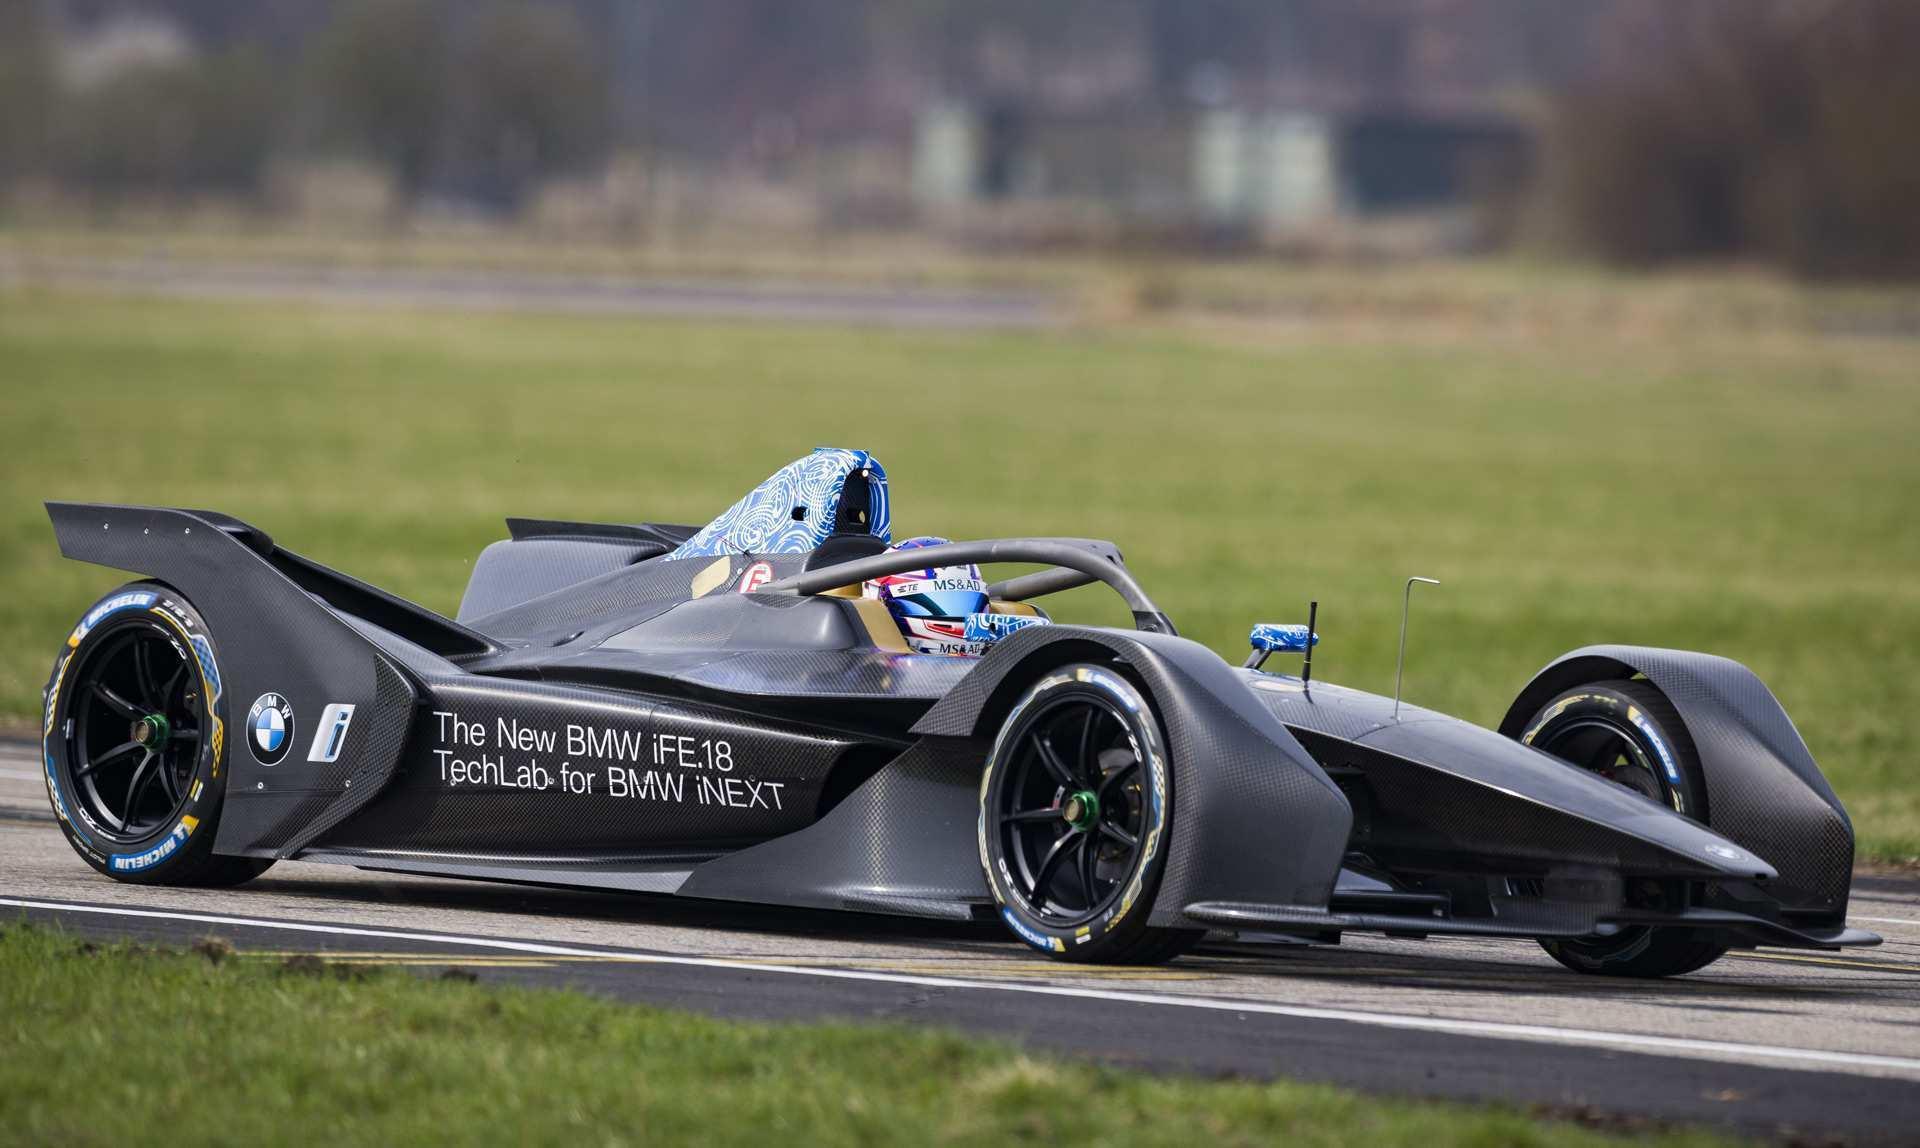 30 Best Review Mercedes Formula E 2020 History for Mercedes Formula E 2020